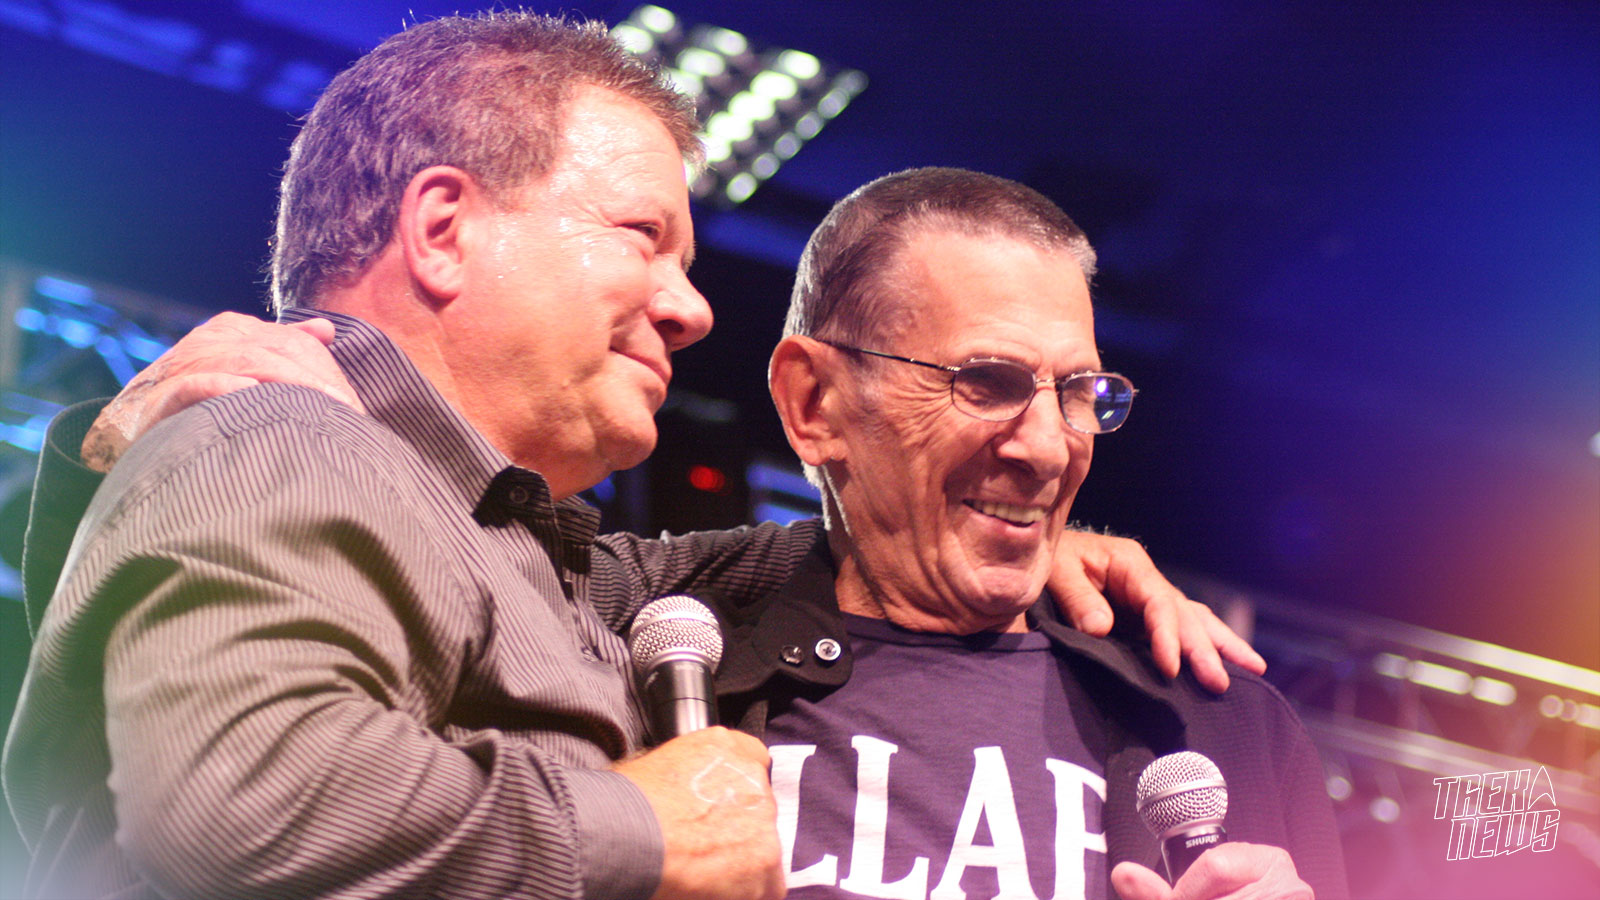 Star Trek Las Vegas Convention Recap: William Shatner, Leonard Nimoy, Patrick Stewart, Jeri Ryan & More